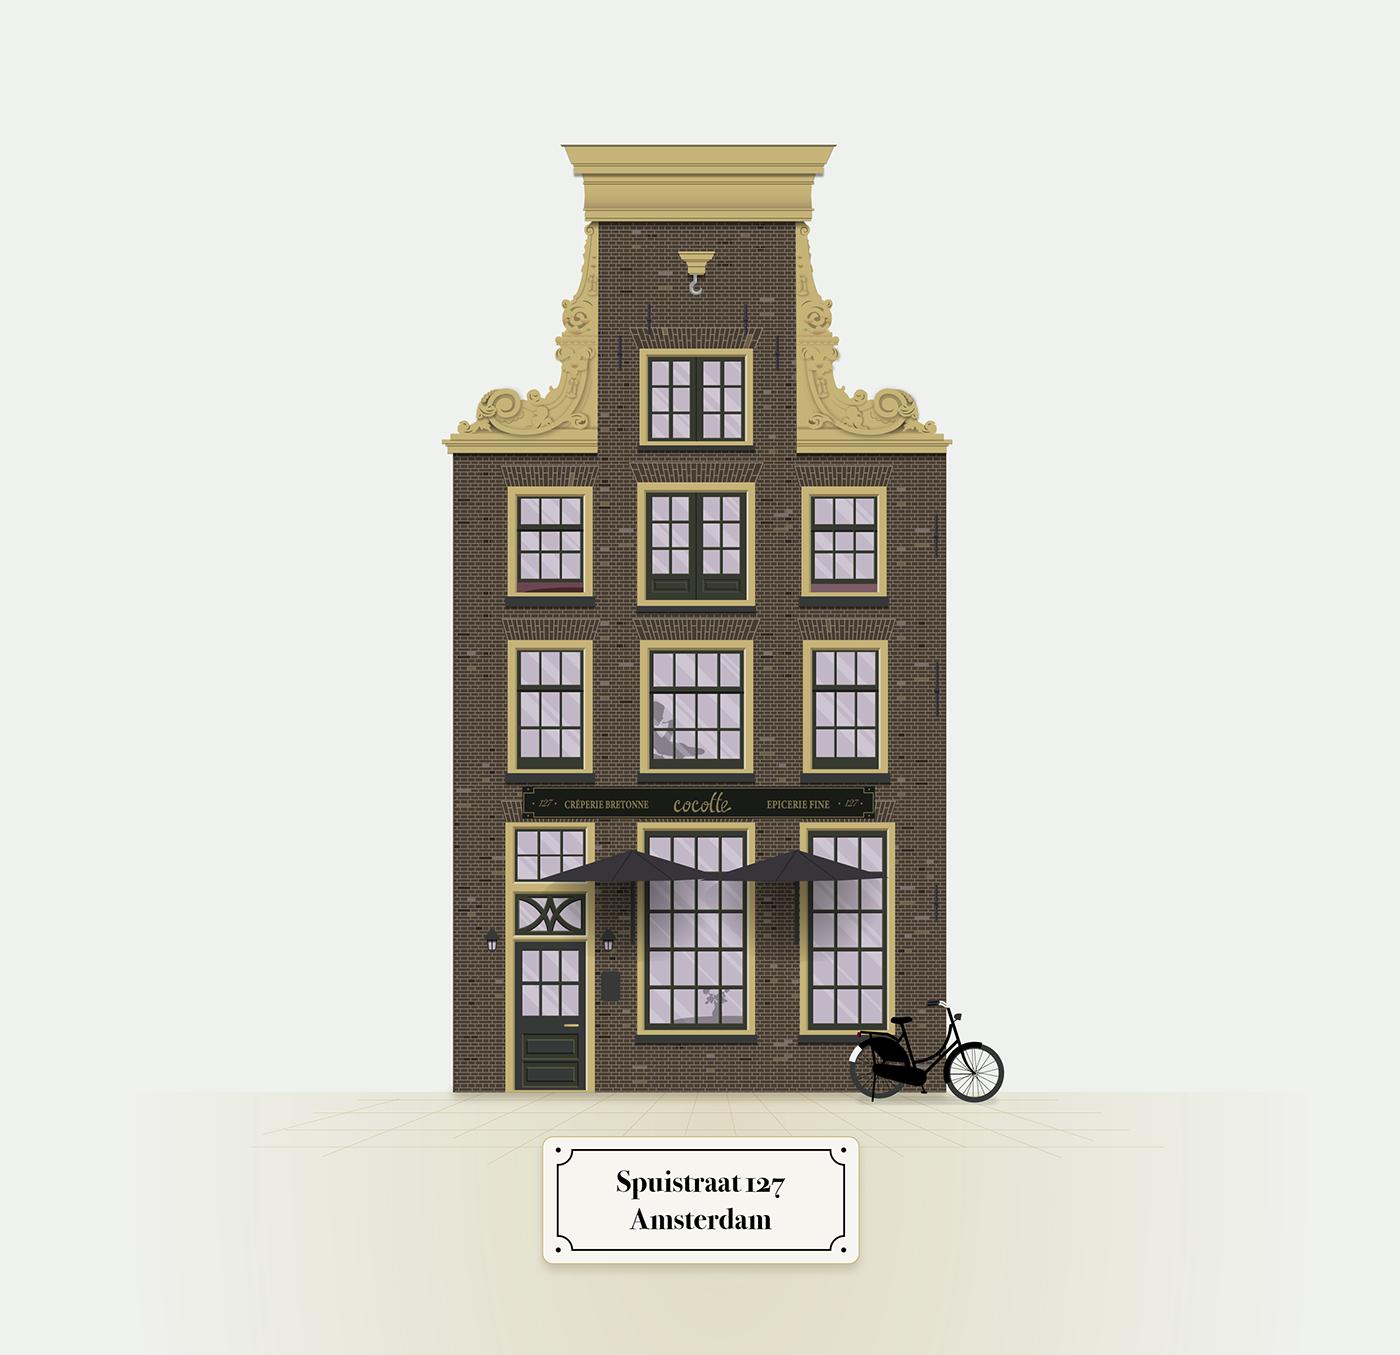 ILLUSTRATION  amsterdam dutch Netherlands monument building nederlands grachtenpand realistic